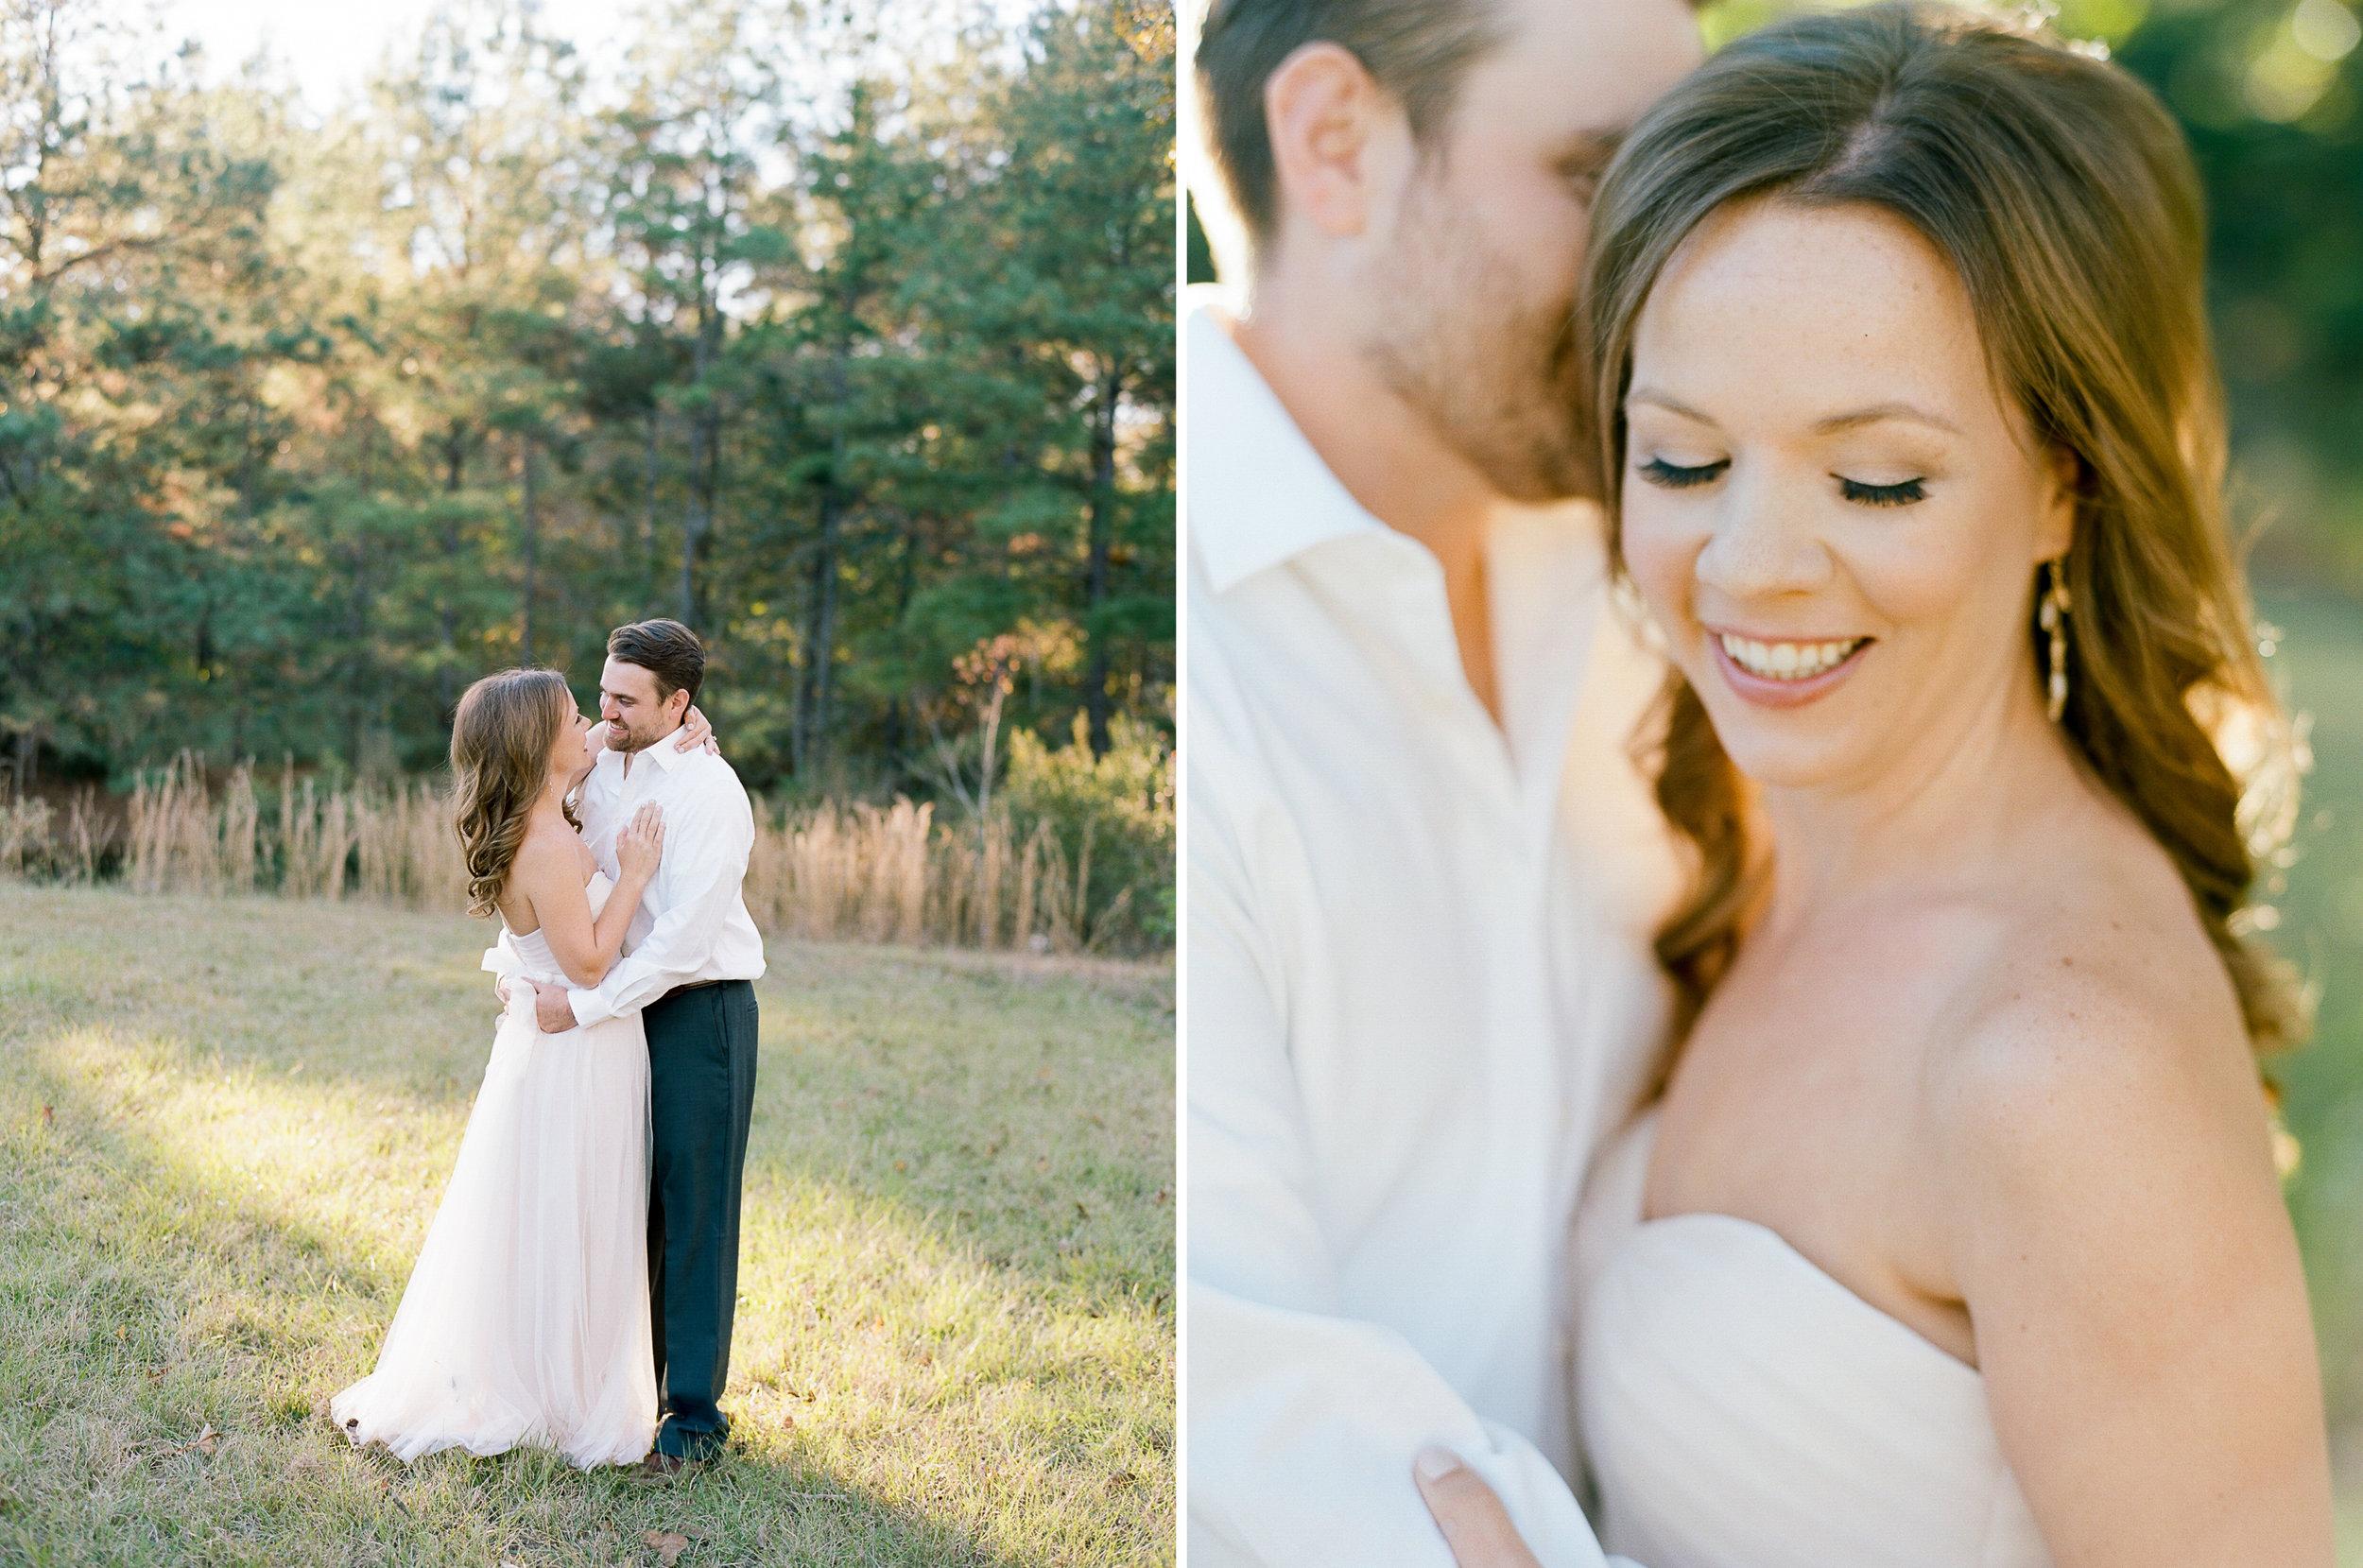 dana-fernandez-photography-houston-wedding-photographer-portraits-engagements-anniversary-session-film-photographer-austin-wedding-photographer-106.jpg